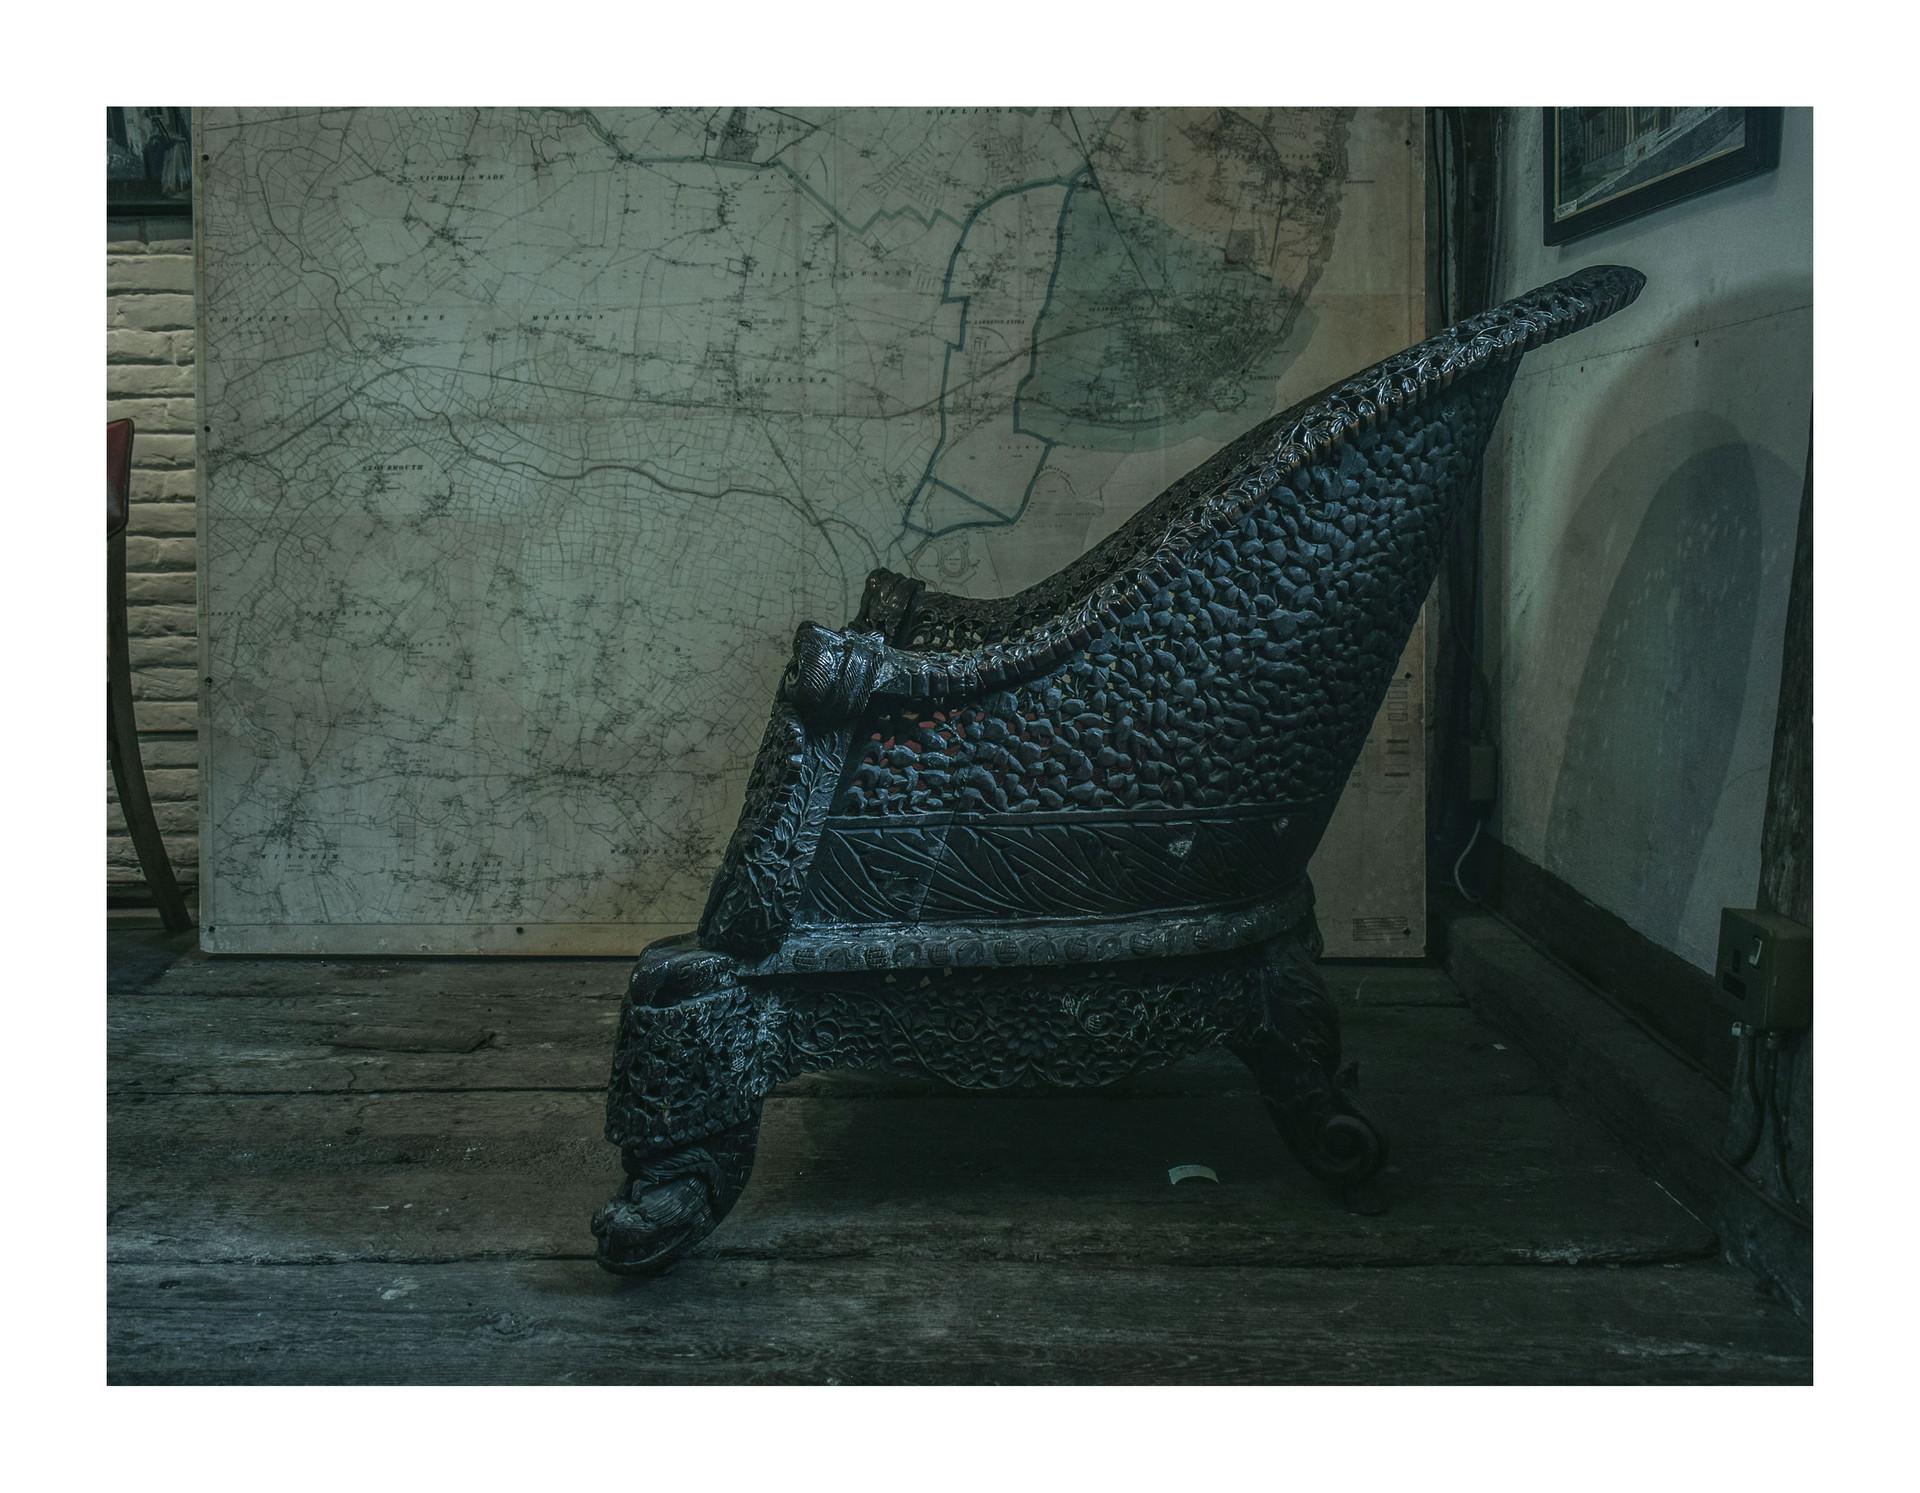 Antique Thai armchair - Tudor House Museum, Margate, 2018